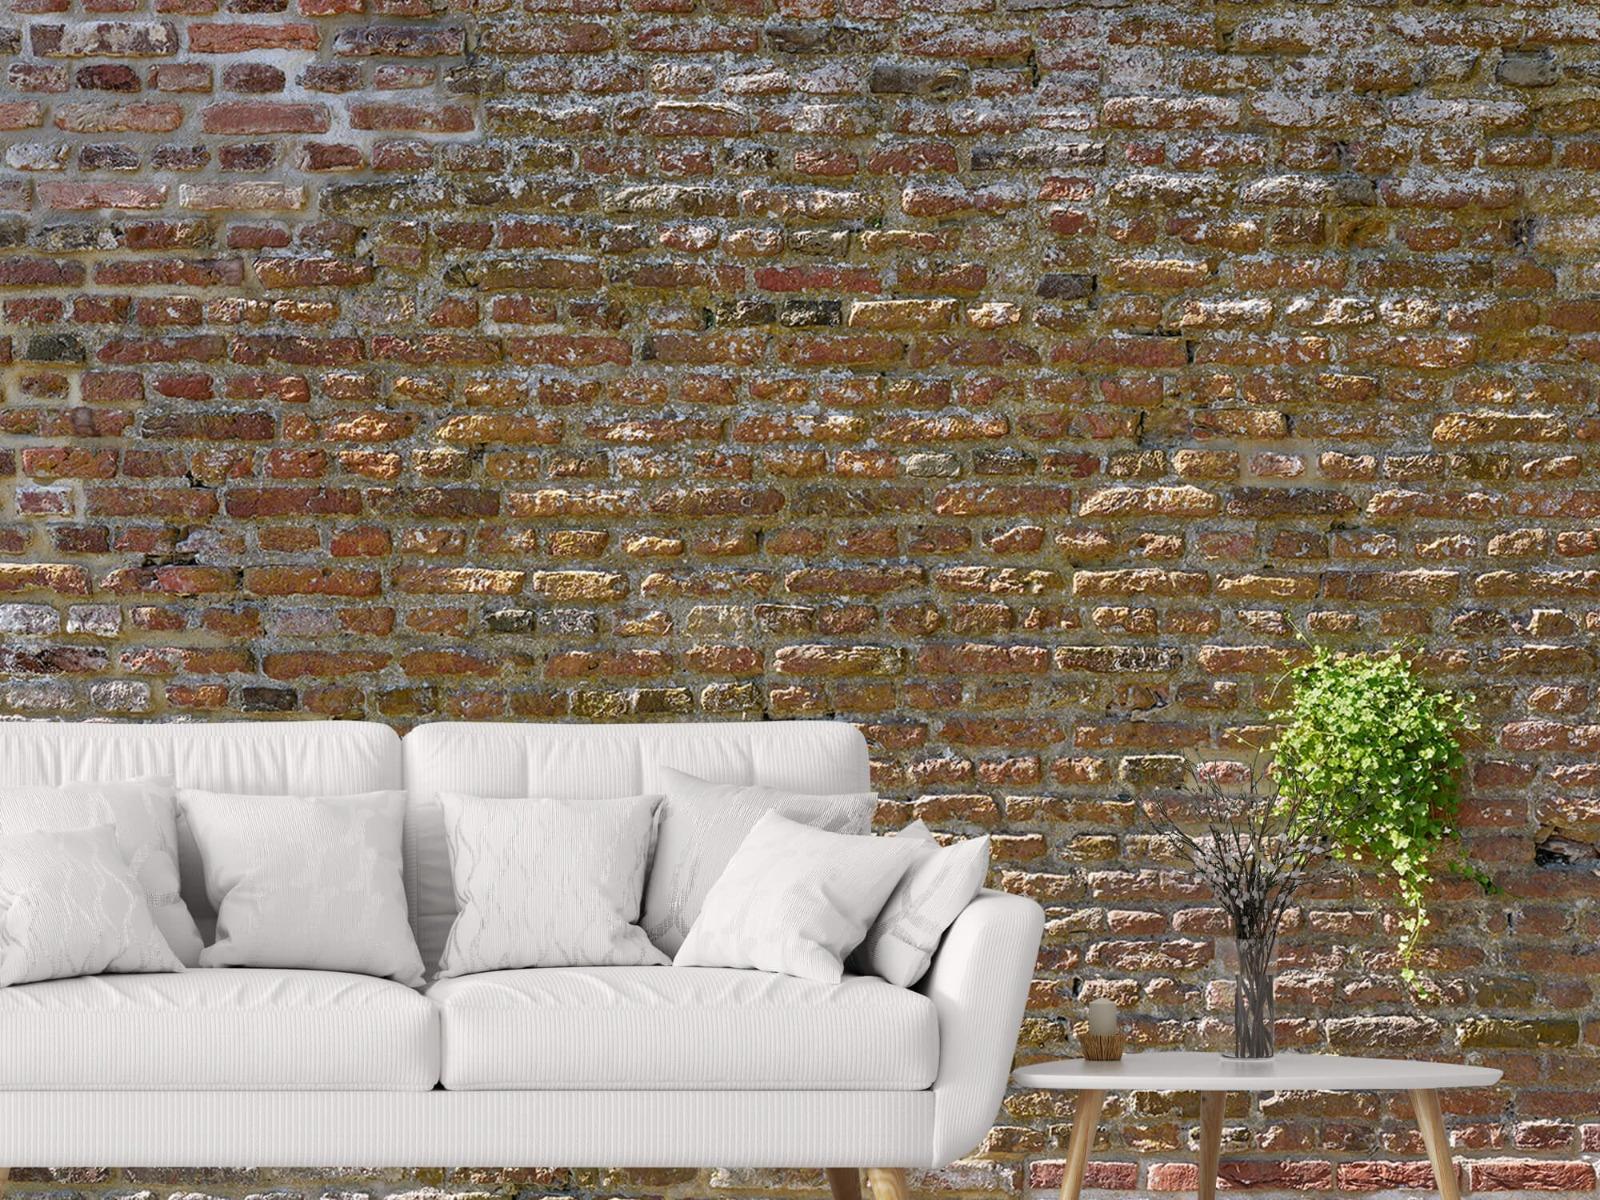 Stenen - Oude stenen stadsmuur met plantjes 4